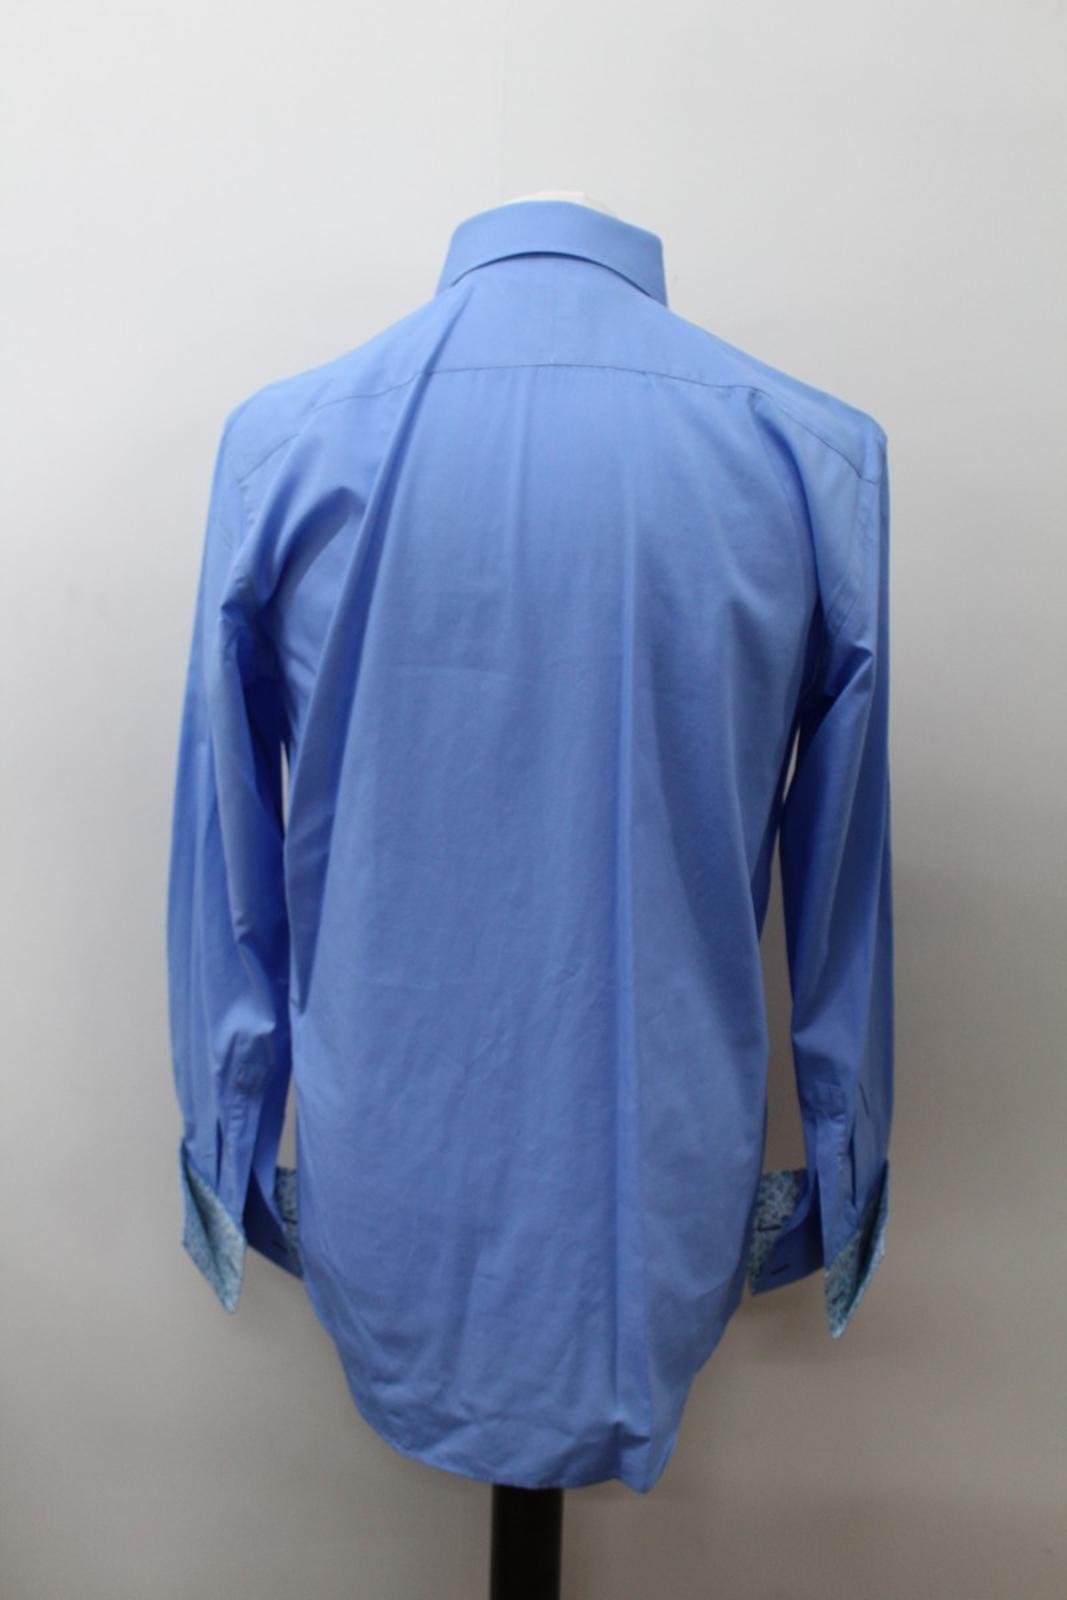 Paul-Smith-Hombres-Azul-Algodon-Mangas-Largas-Camisa-De-Puno-Doble-Cuello-16-5-034-42cm miniatura 5